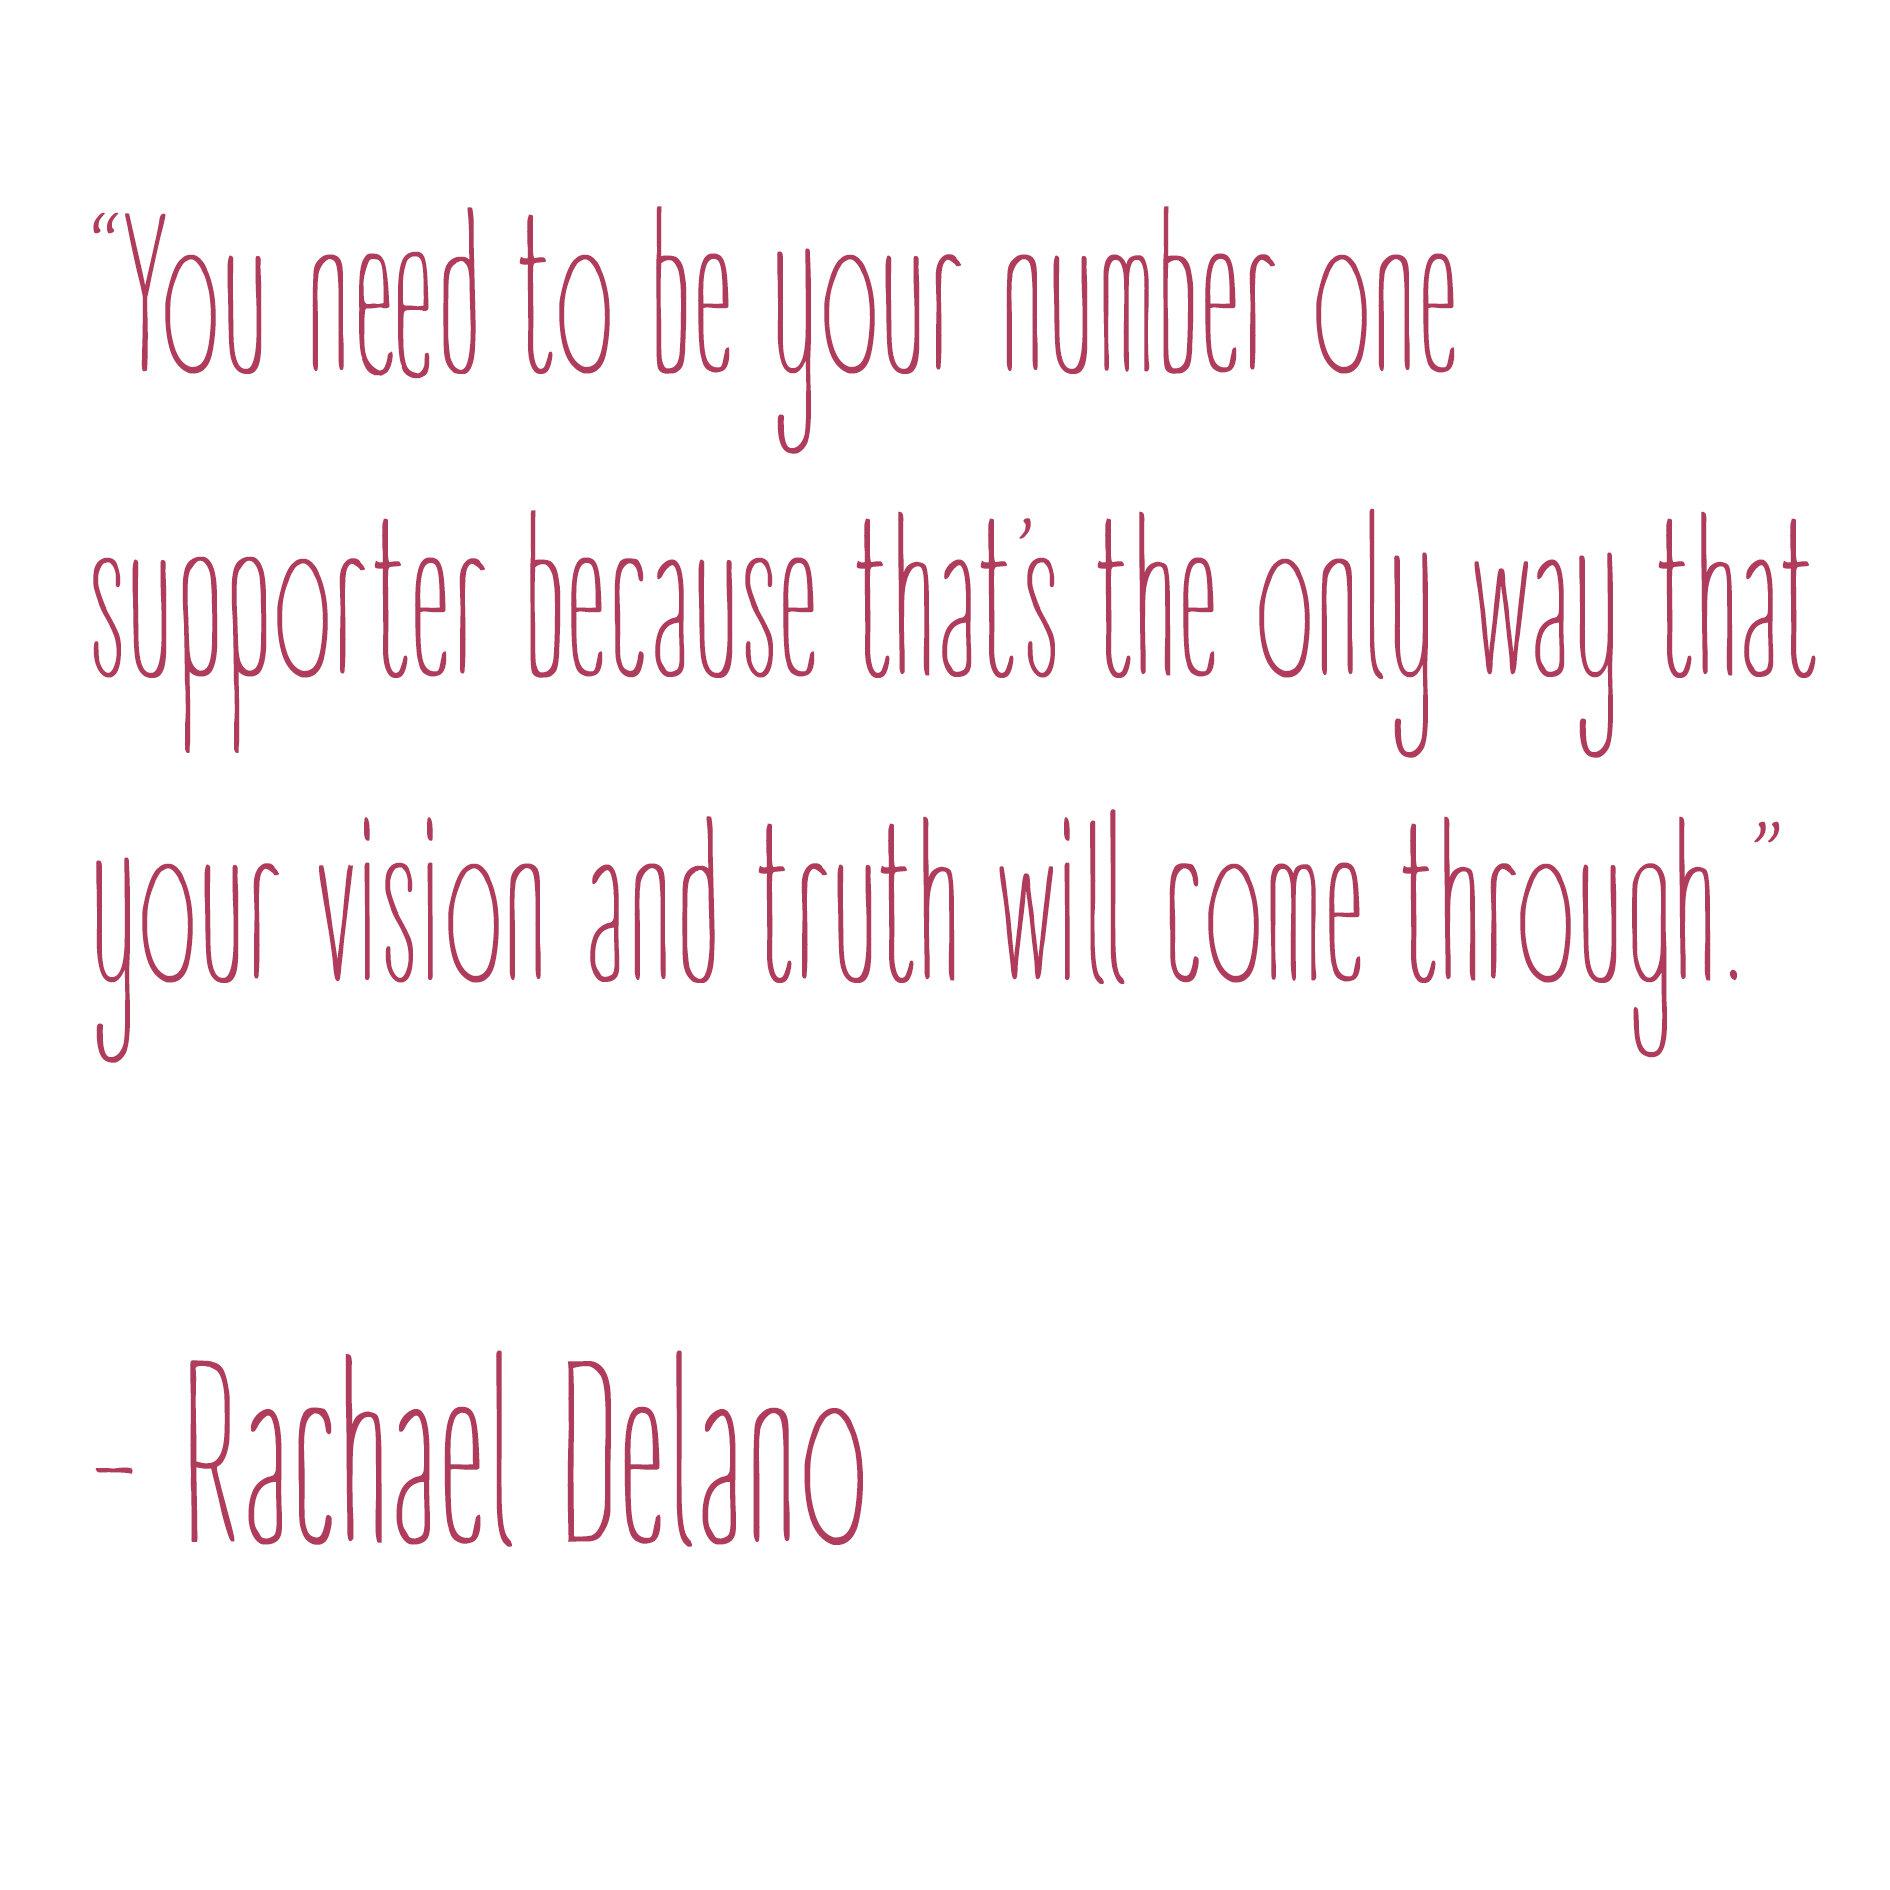 Rachael.delano.brilliansea.